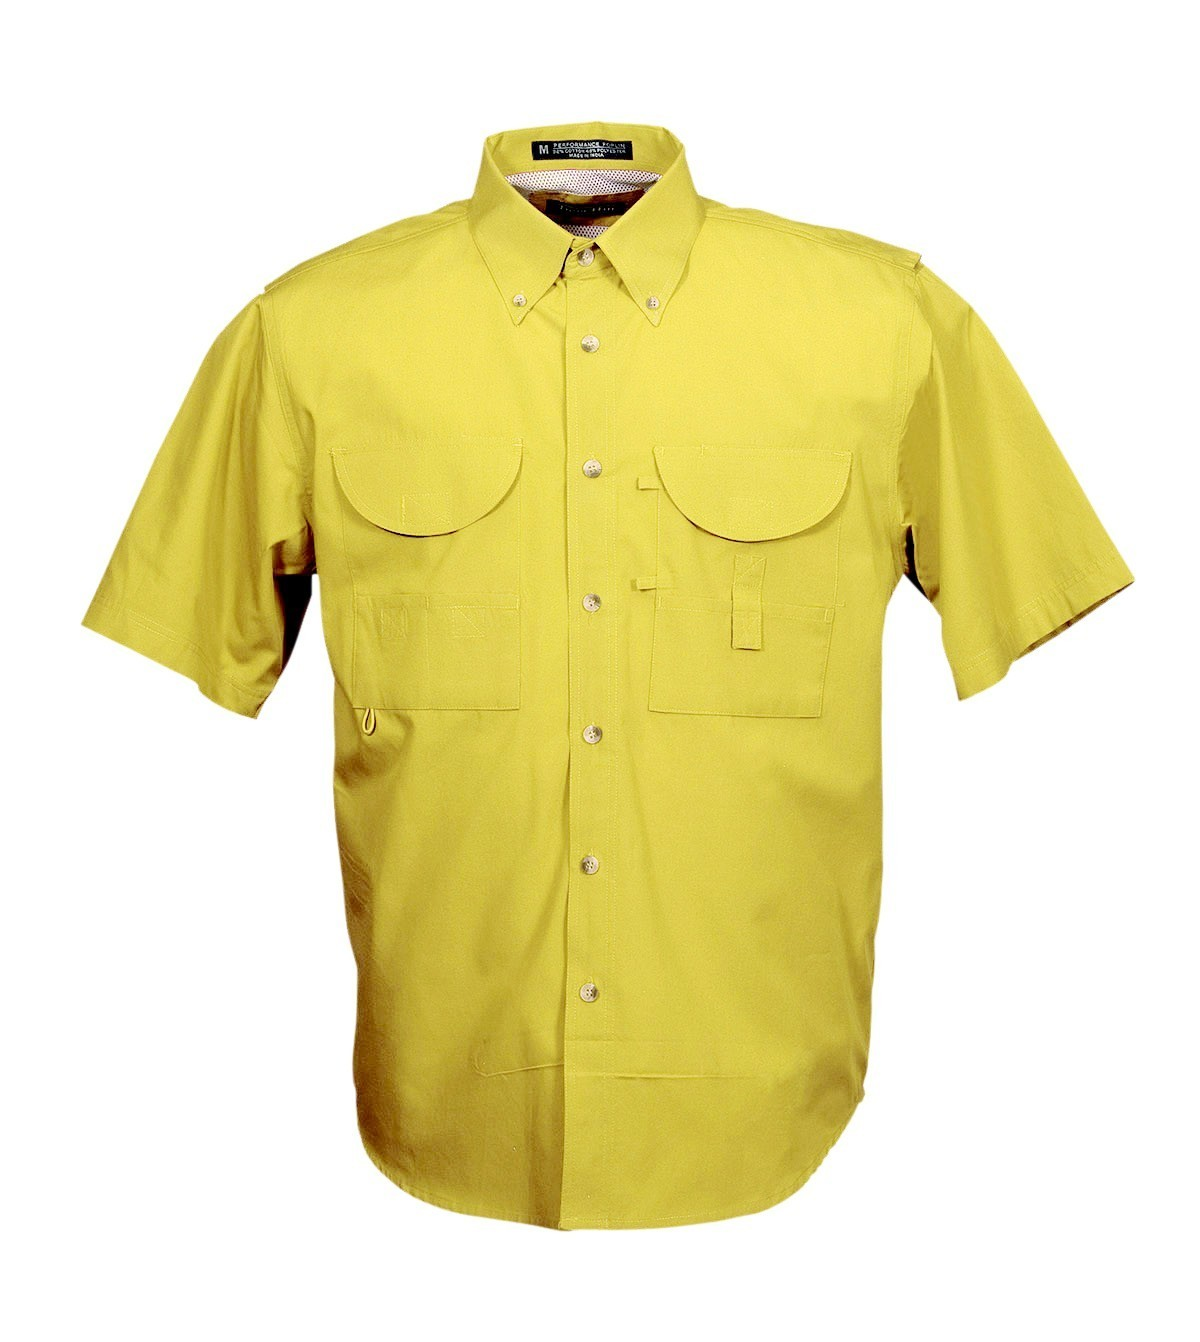 Tiger Hill Men's Fishing Shirt Short Sleeves Yellow